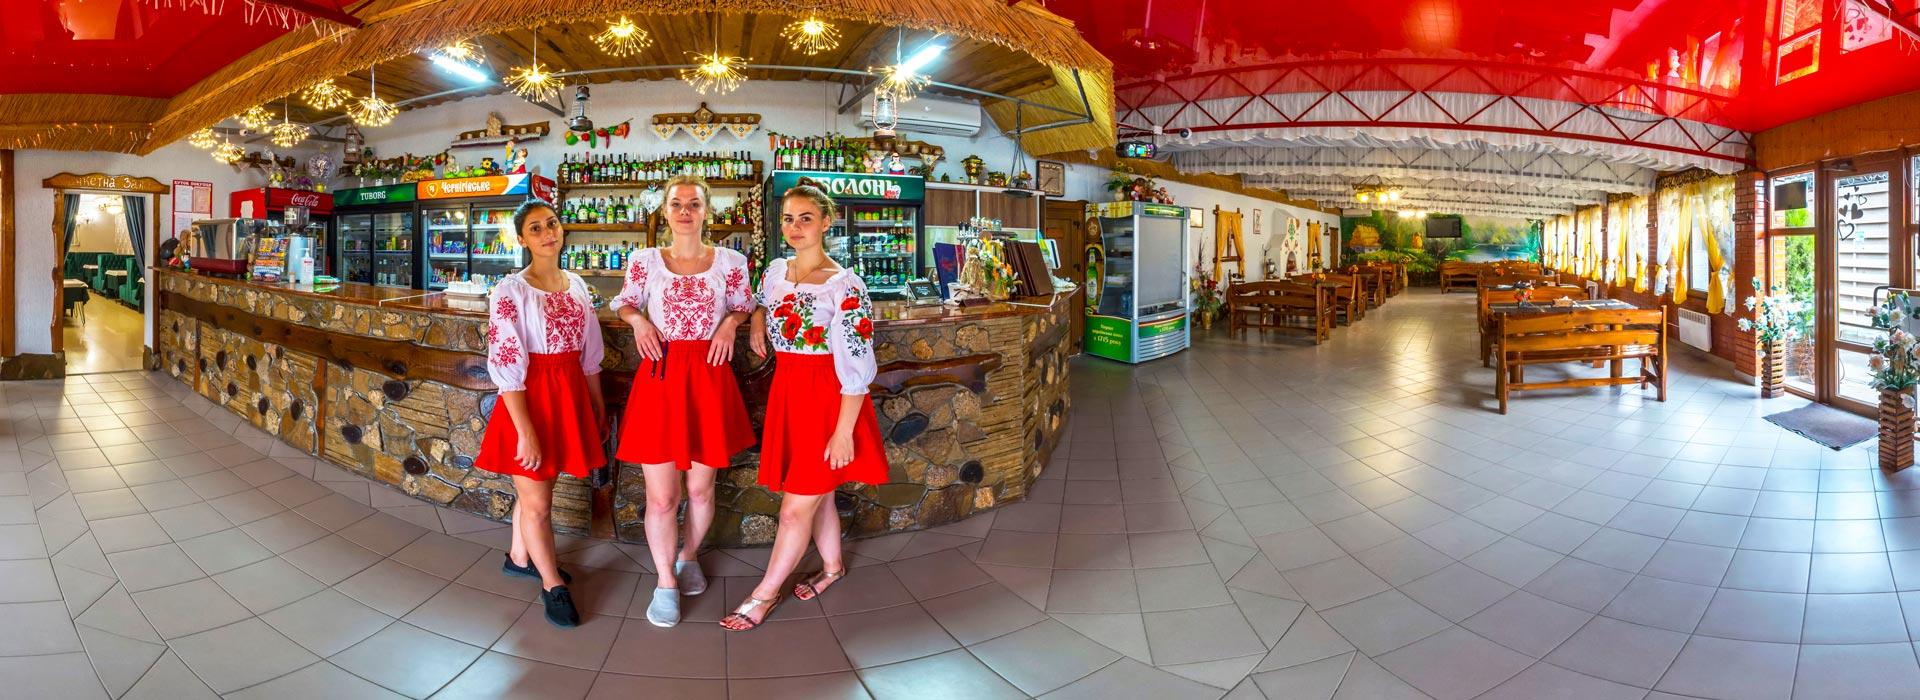 Кафе Українська Хата, Хорлы